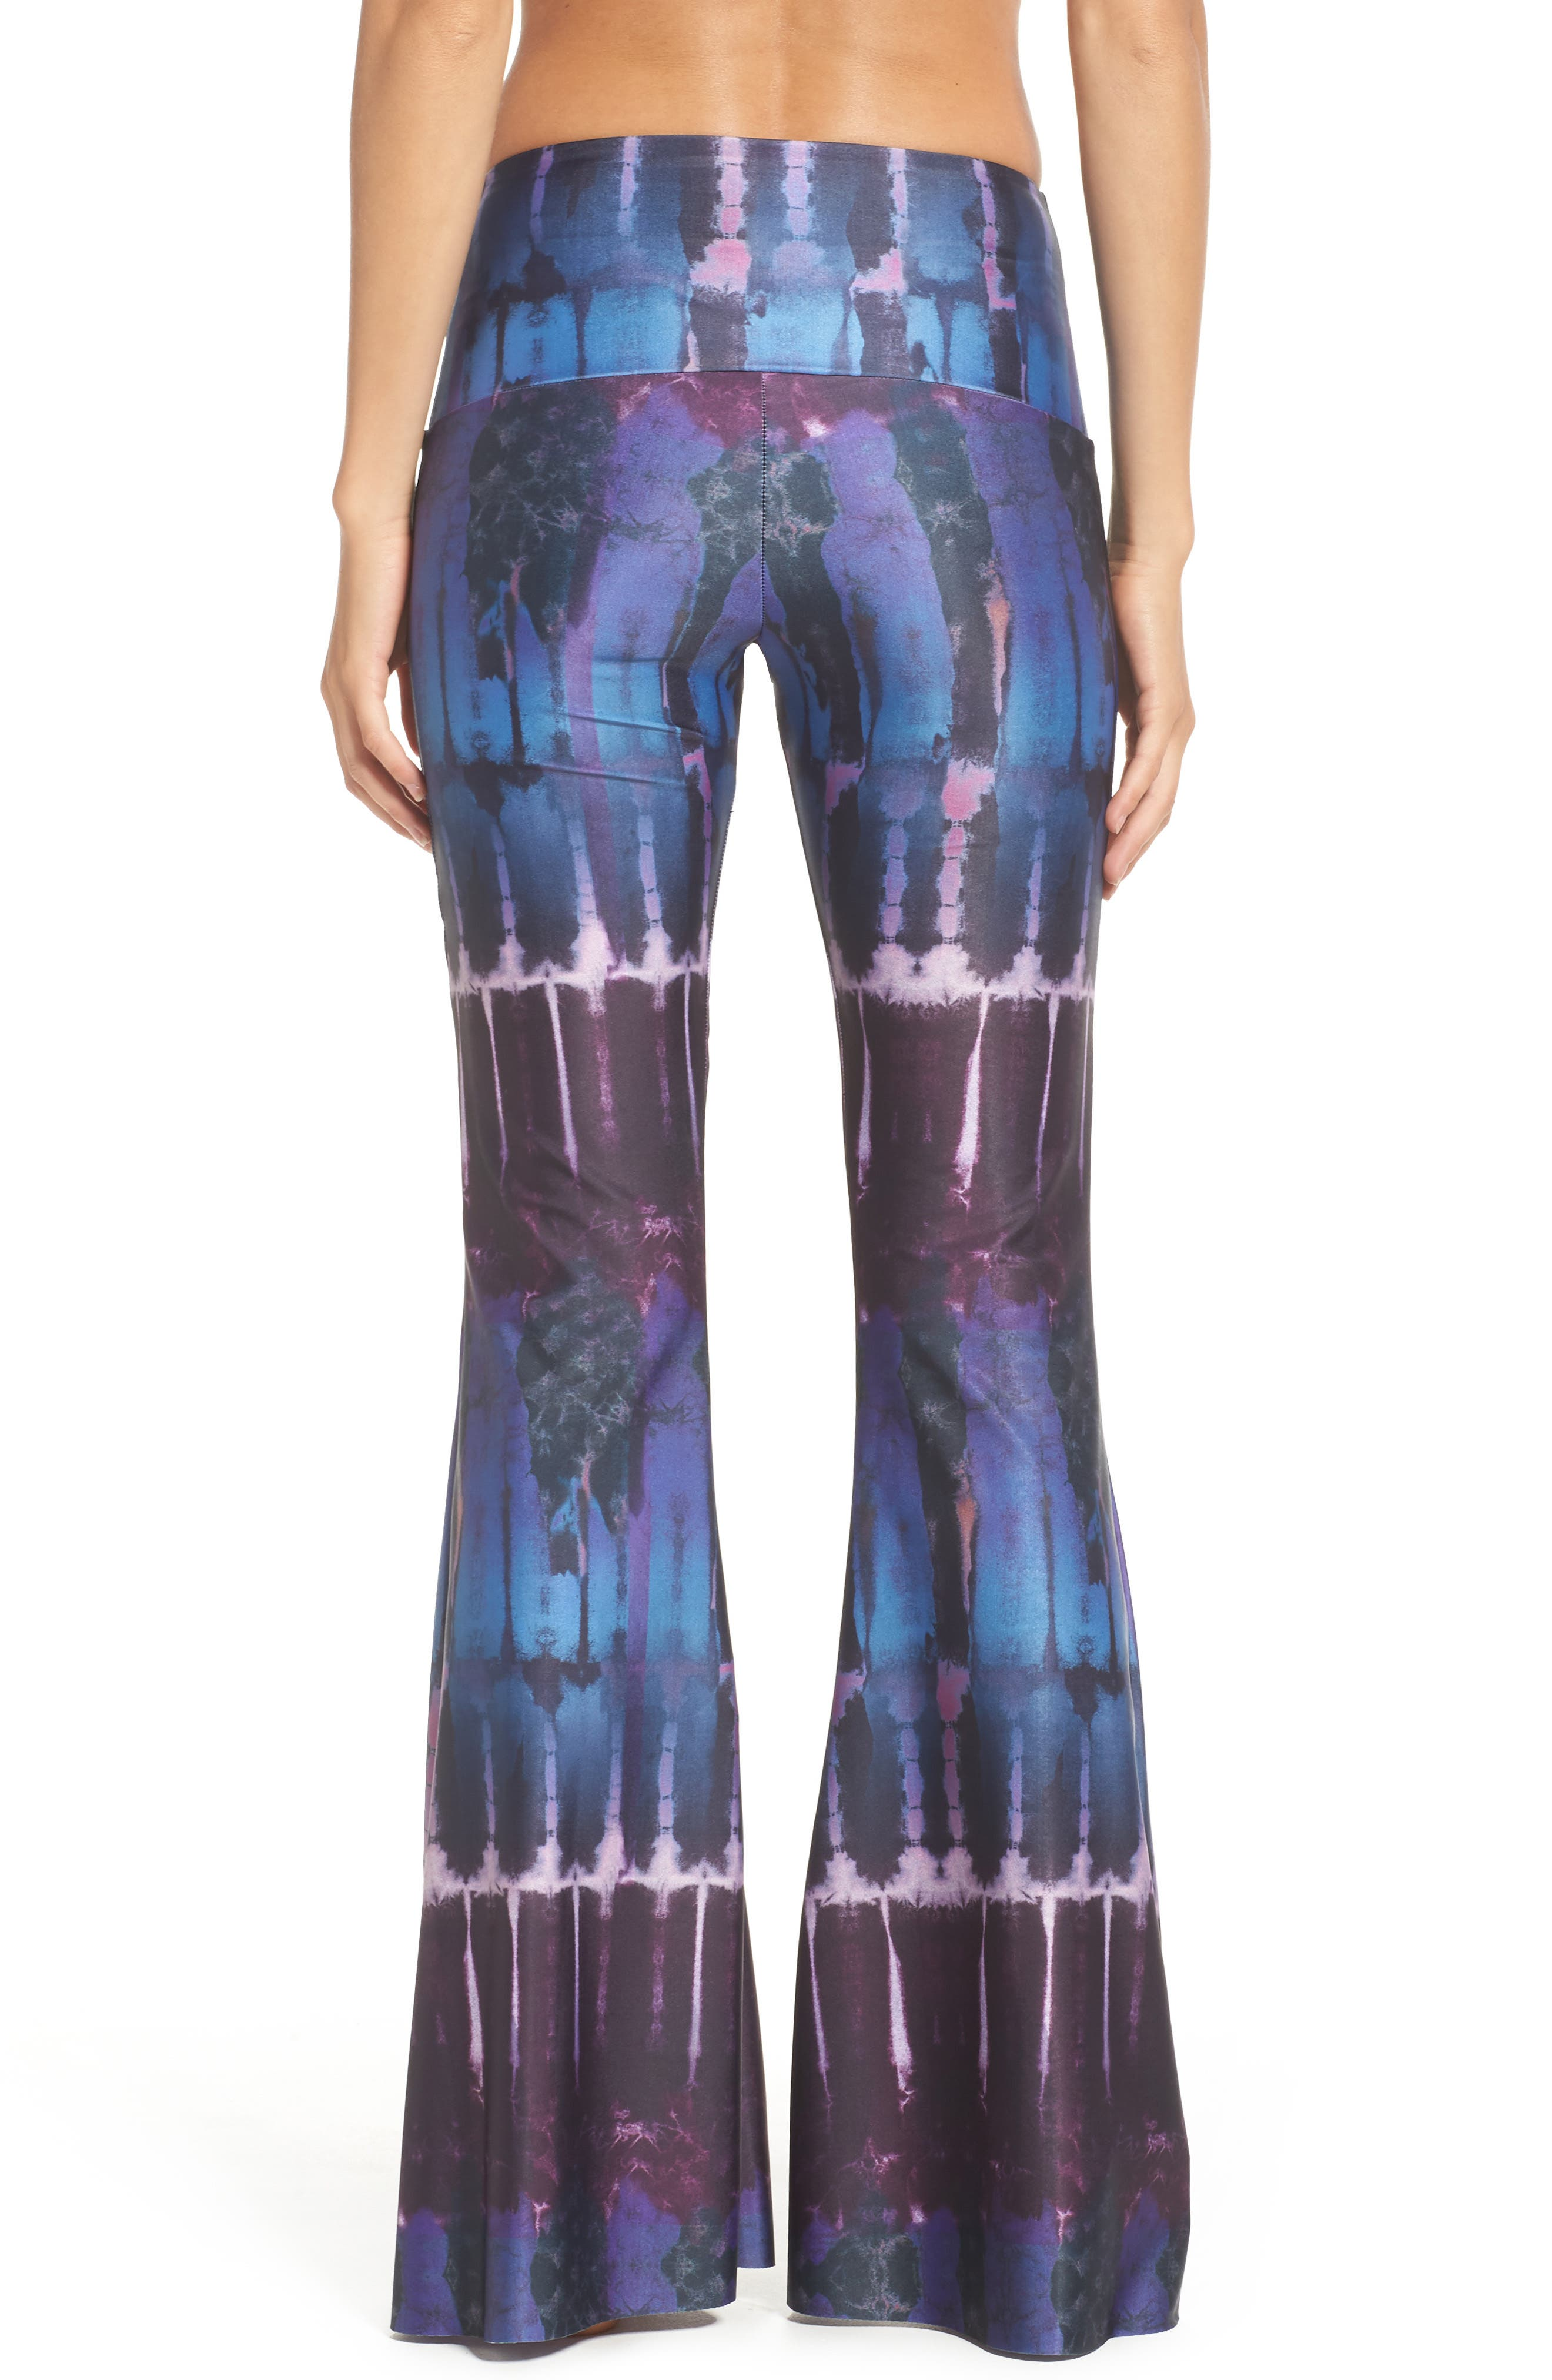 Flare Leg Yoga Pants,                             Alternate thumbnail 9, color,